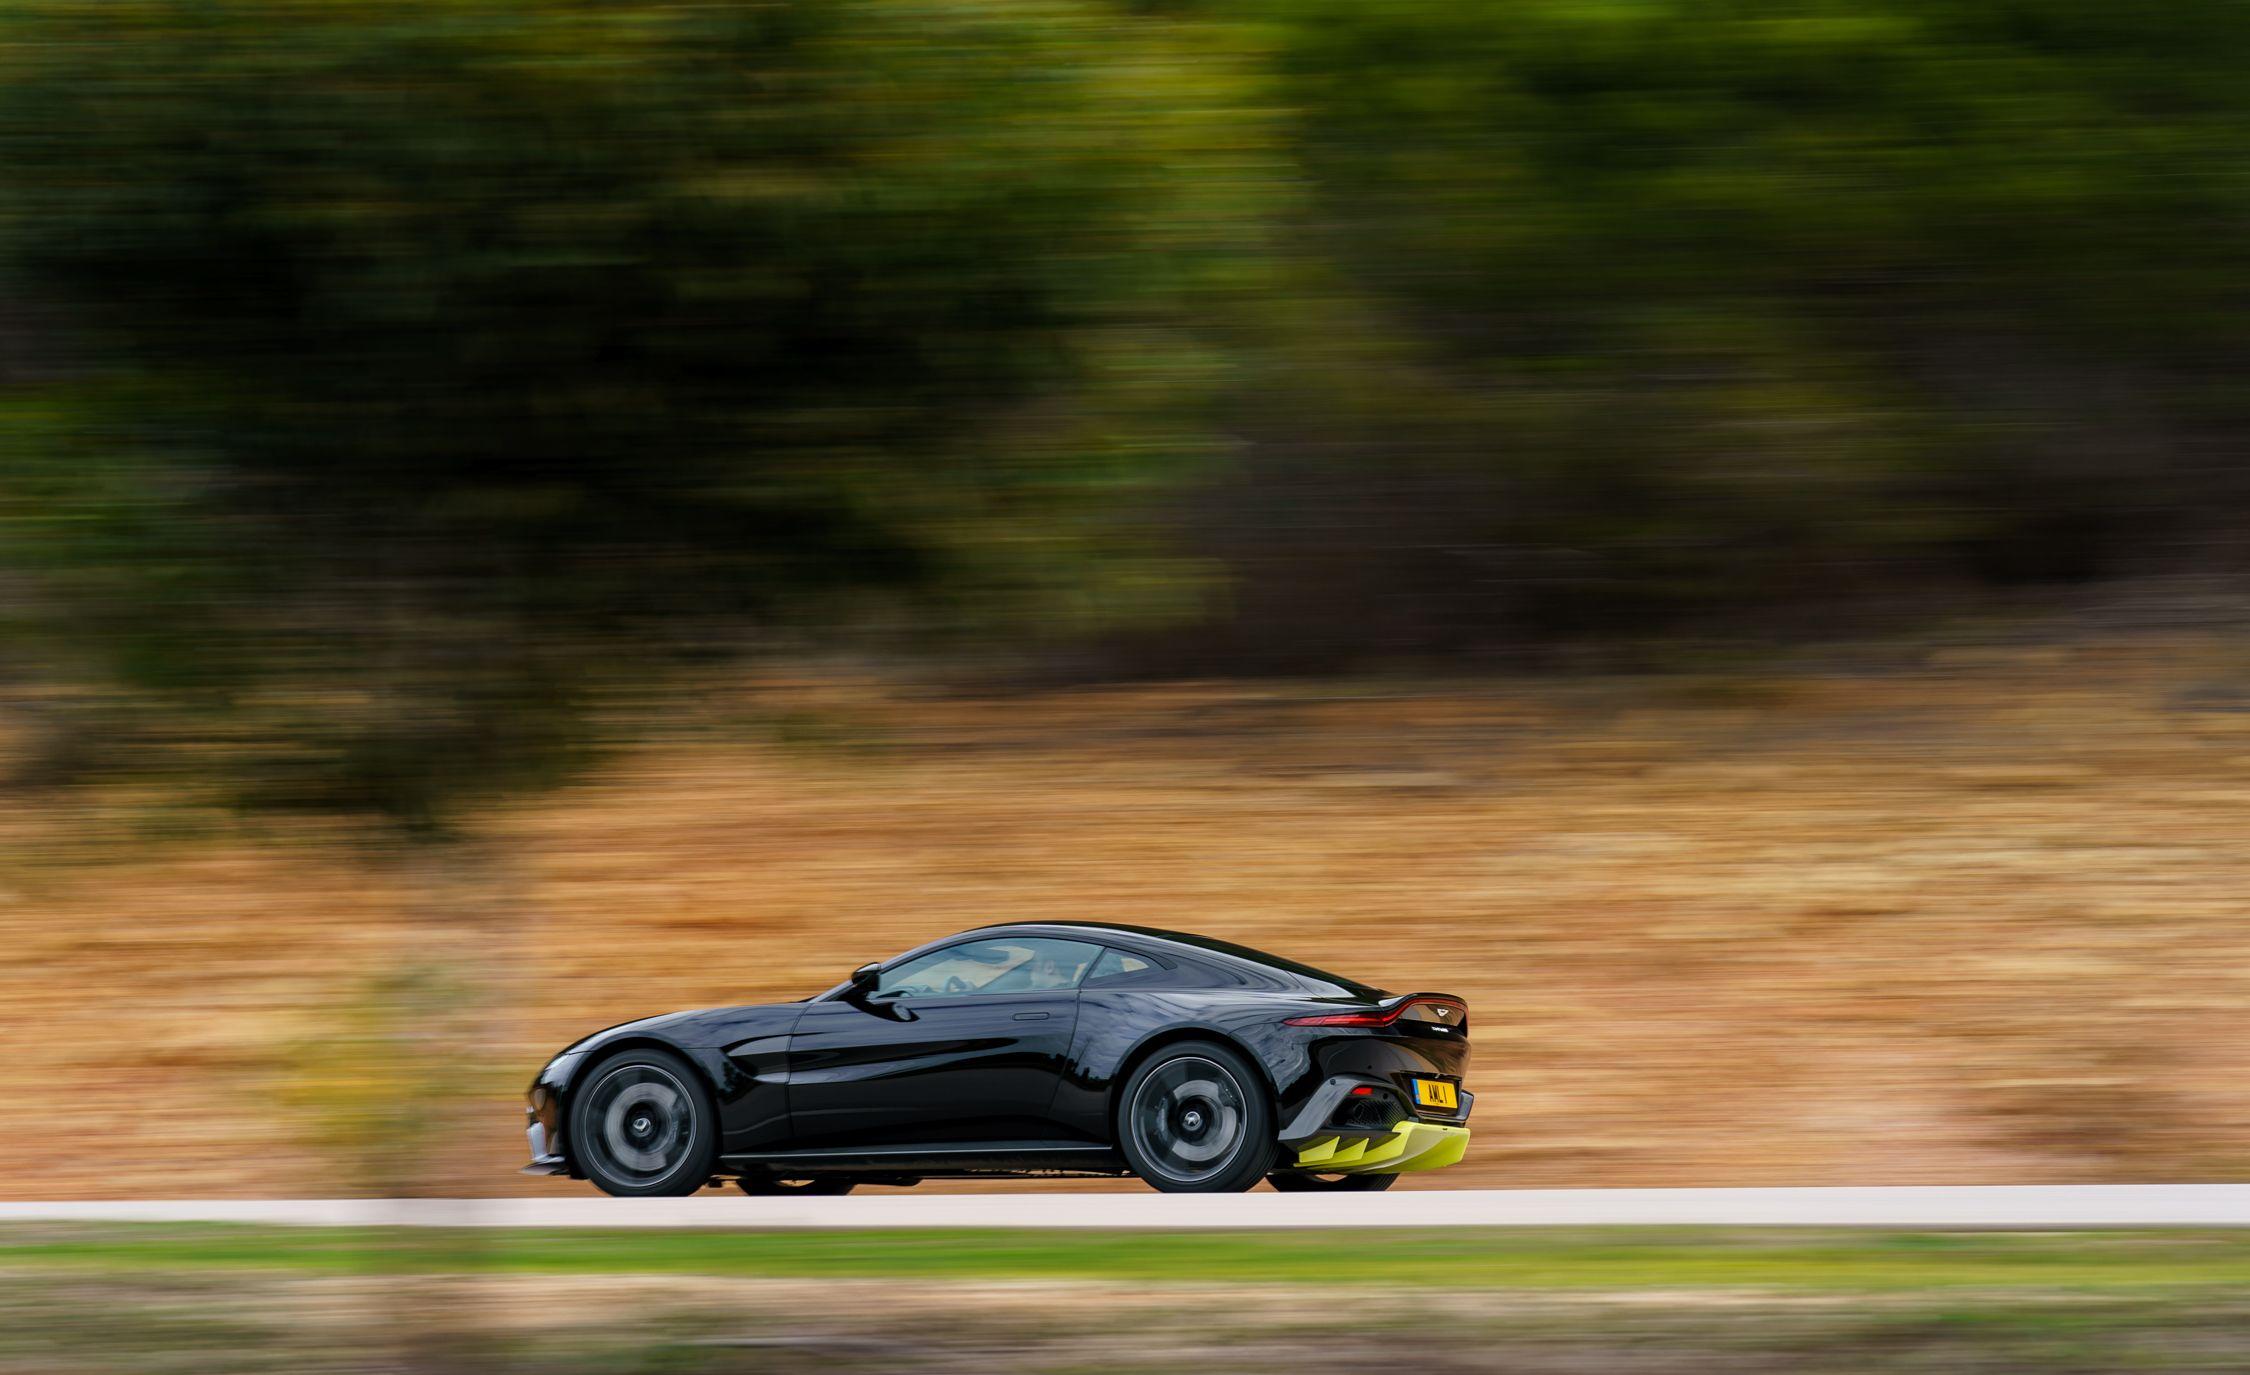 2019 Aston Martin Vantage Reviews Aston Martin Vantage Price